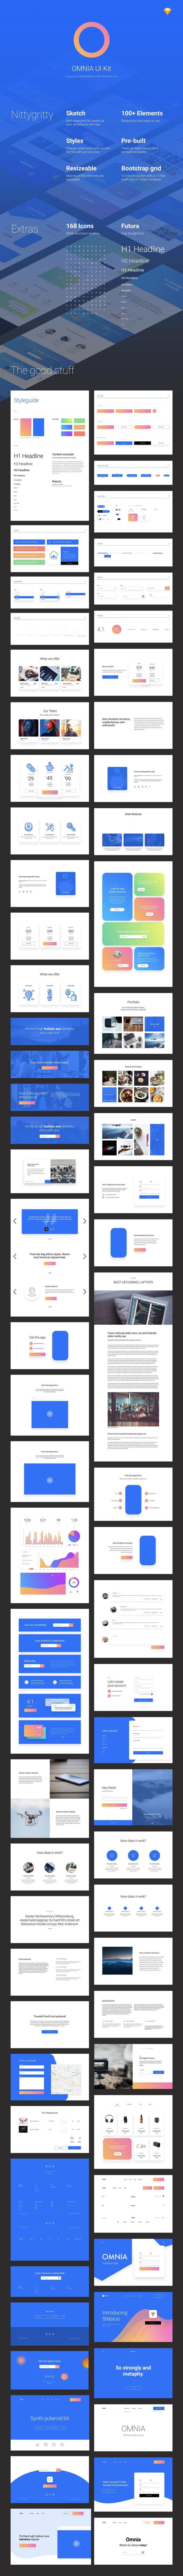 Sketch打造的时尚公司企业产品官网Web Ui Kits套装下载